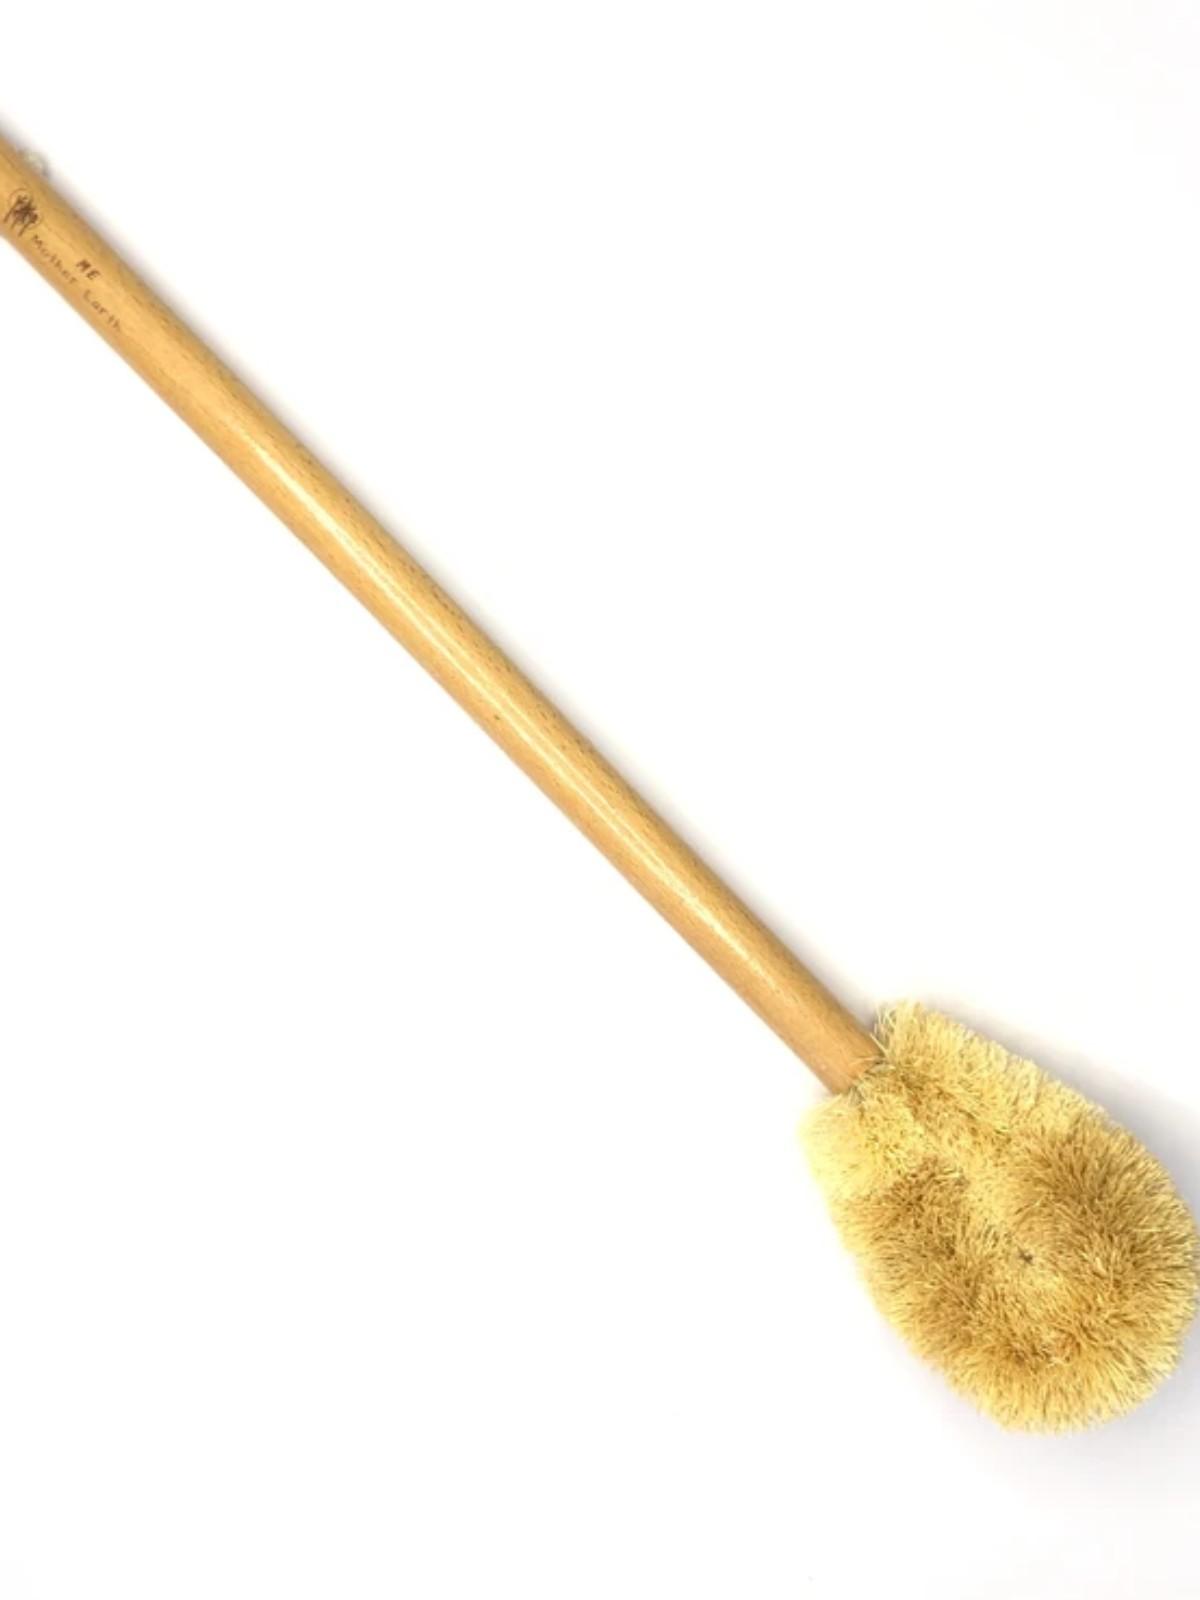 Coconut Toilet Brush